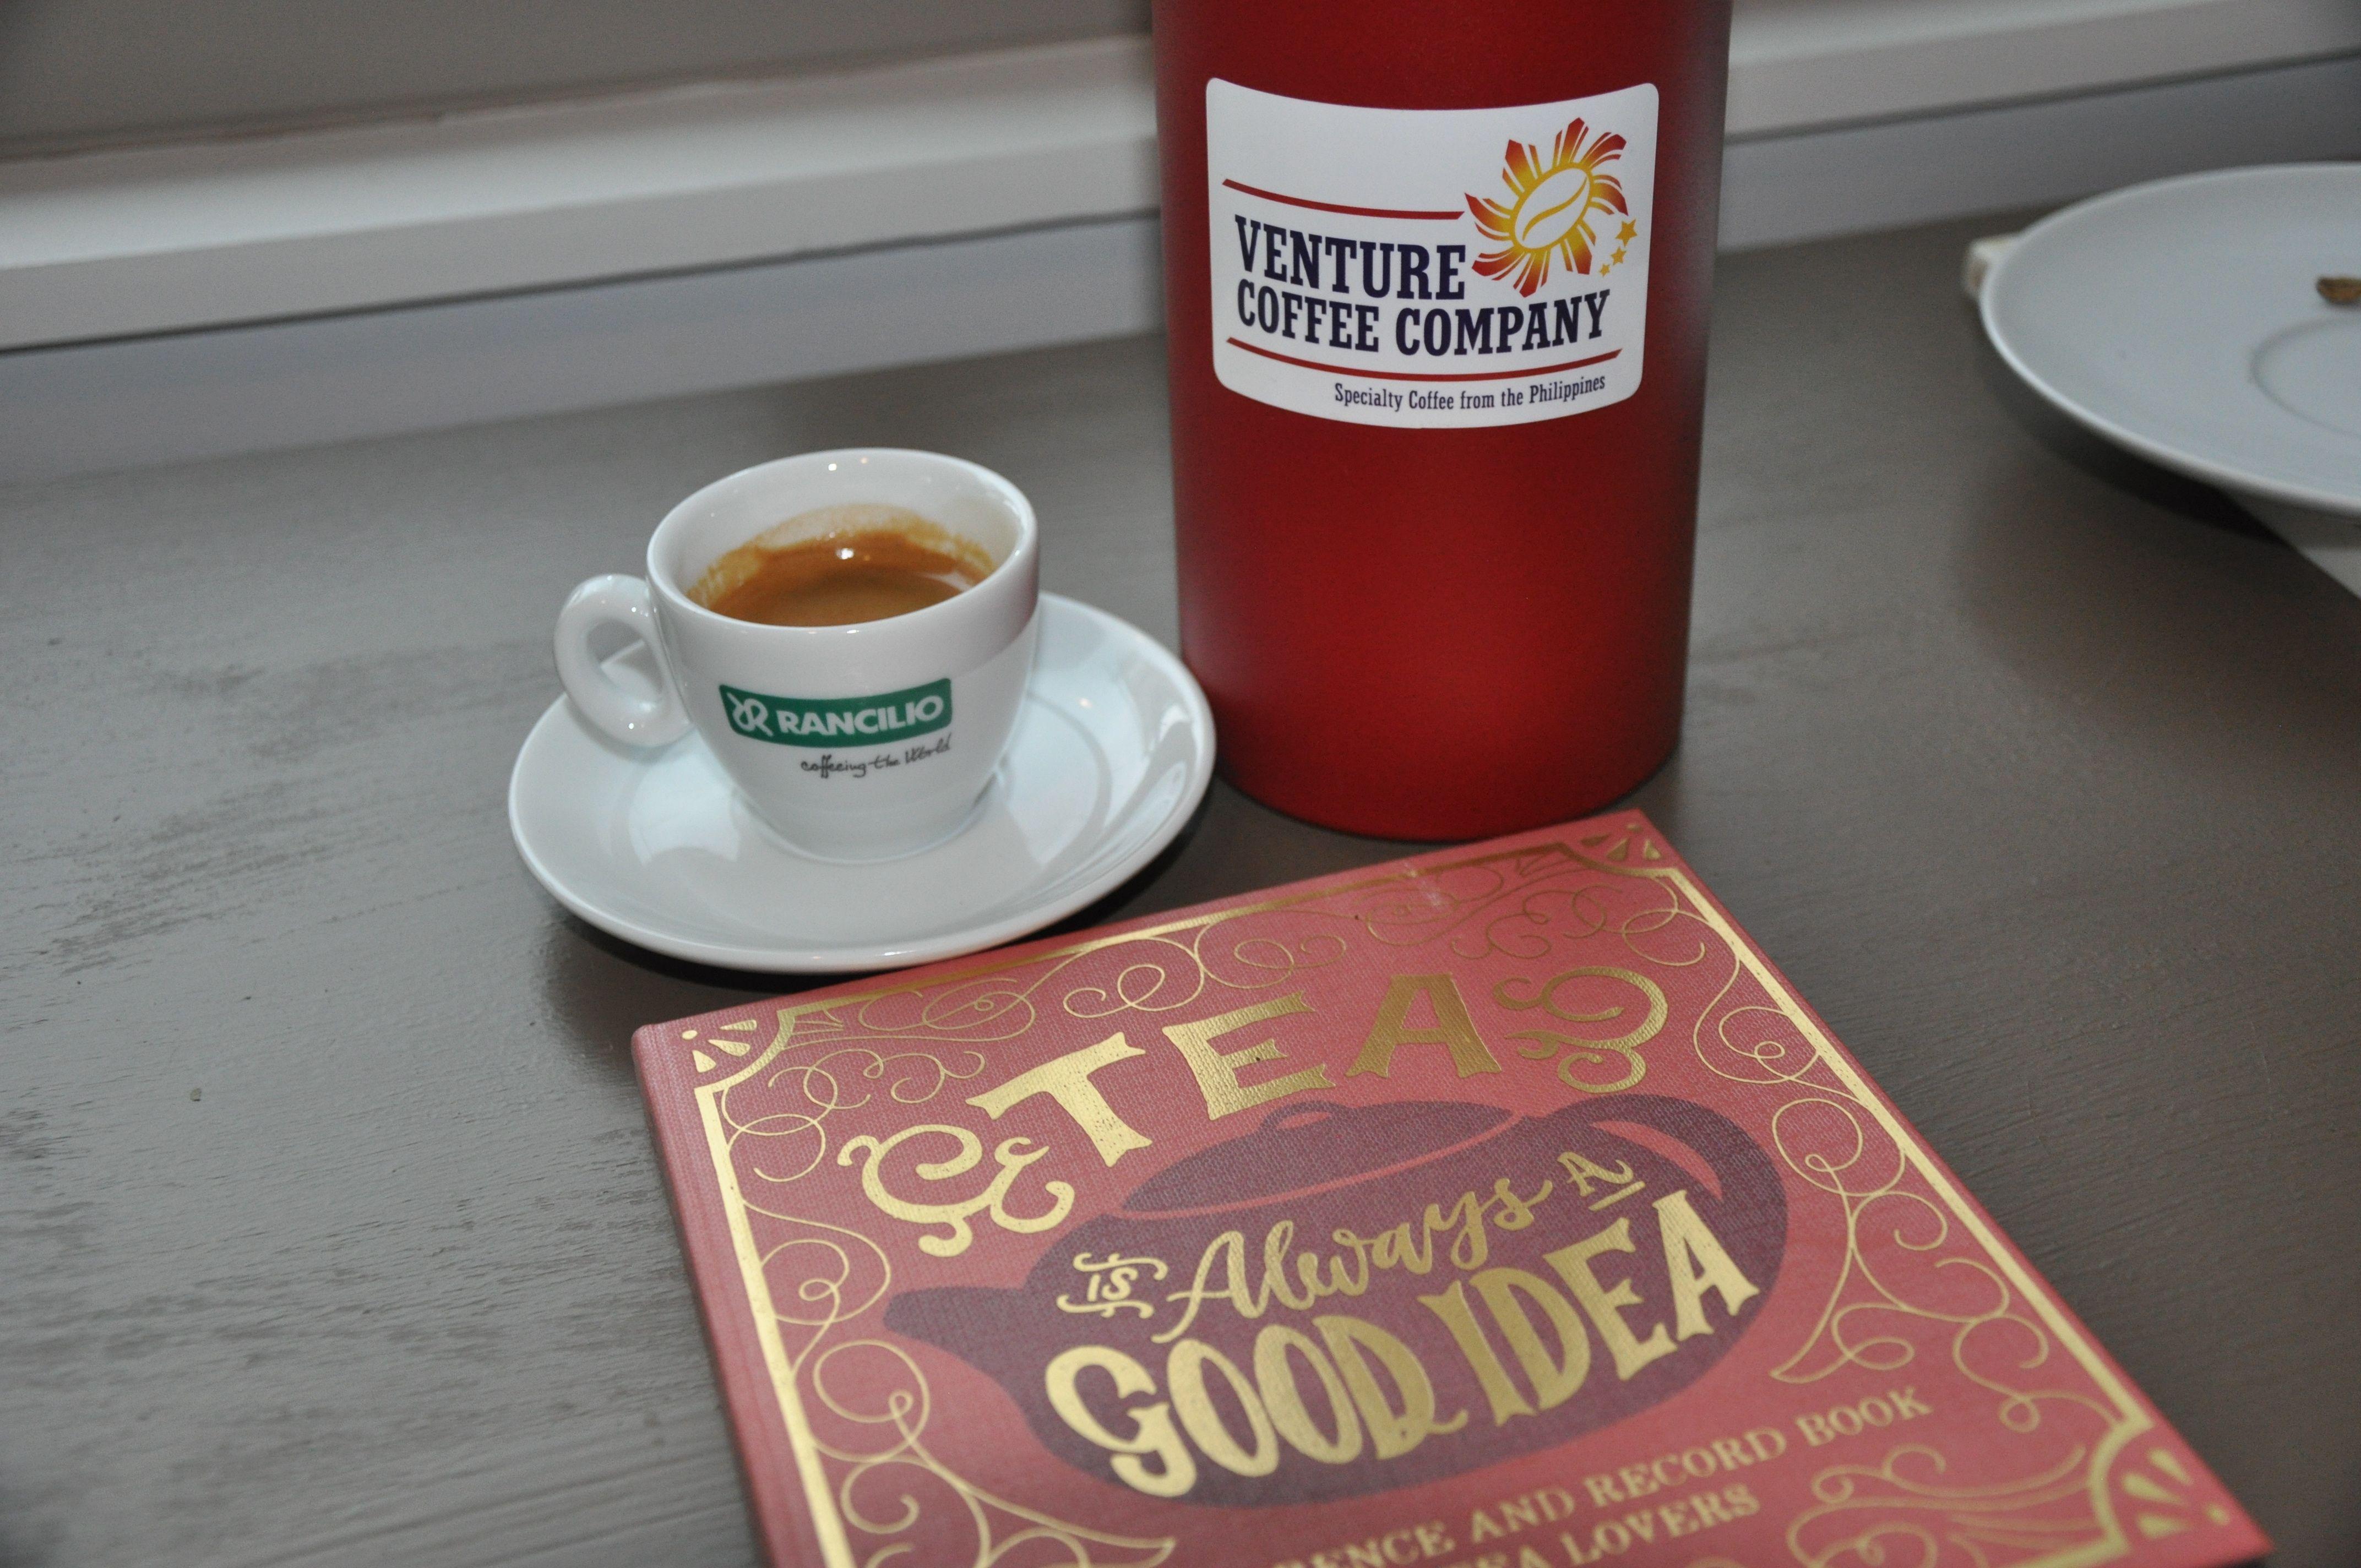 Coffee And Tea In 2020 Dark Roast Coffee Coffee Company